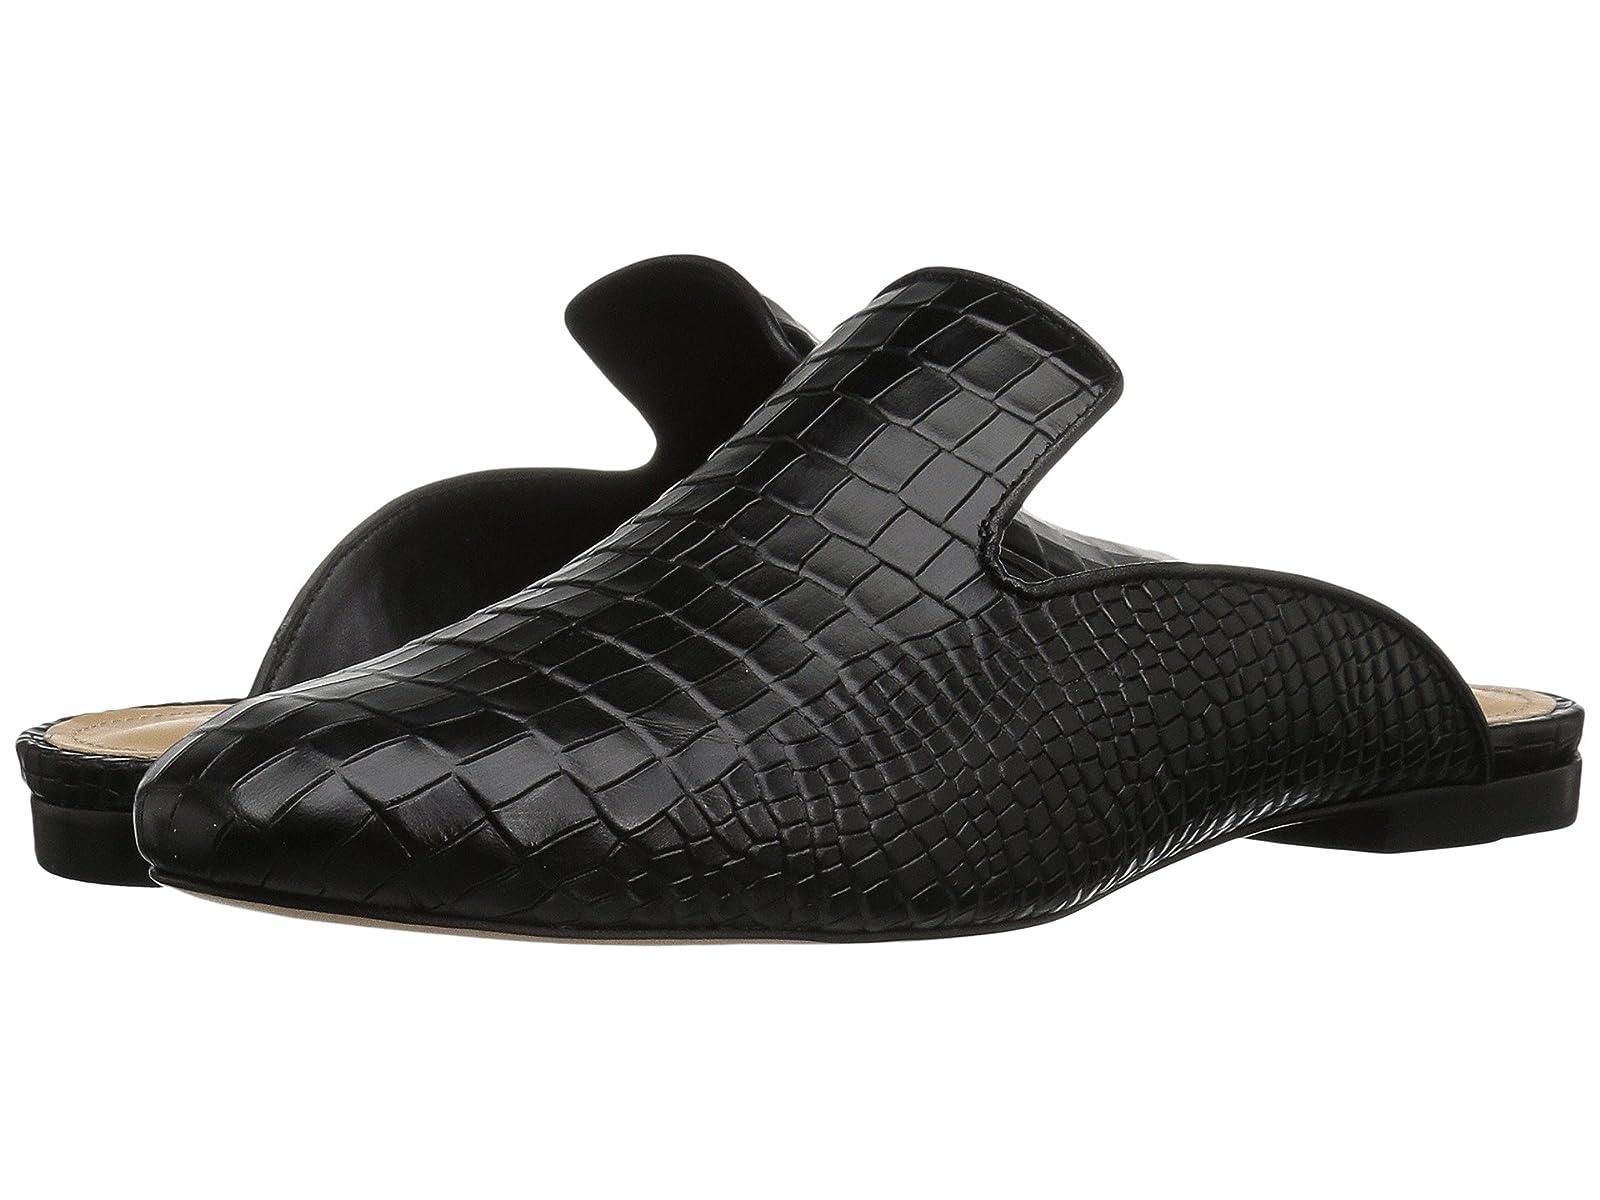 Schutz AvamelCheap and distinctive eye-catching shoes